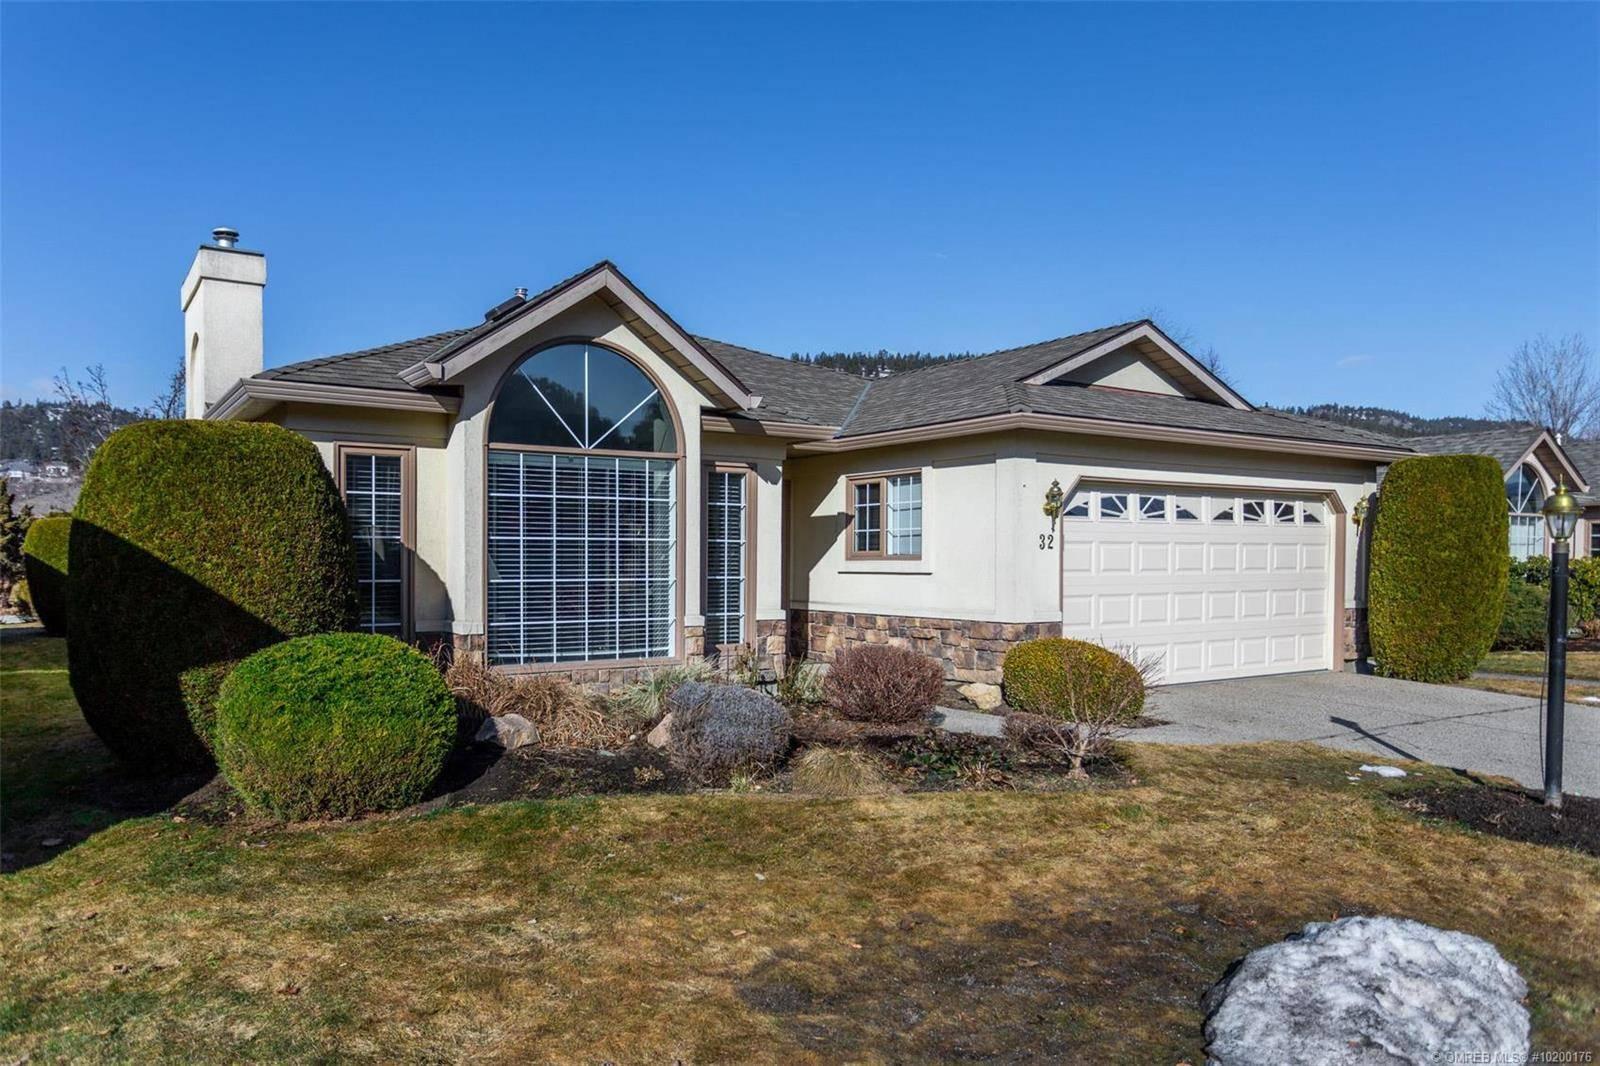 House for sale at 595 Yates Rd Unit 32 Kelowna British Columbia - MLS: 10200176